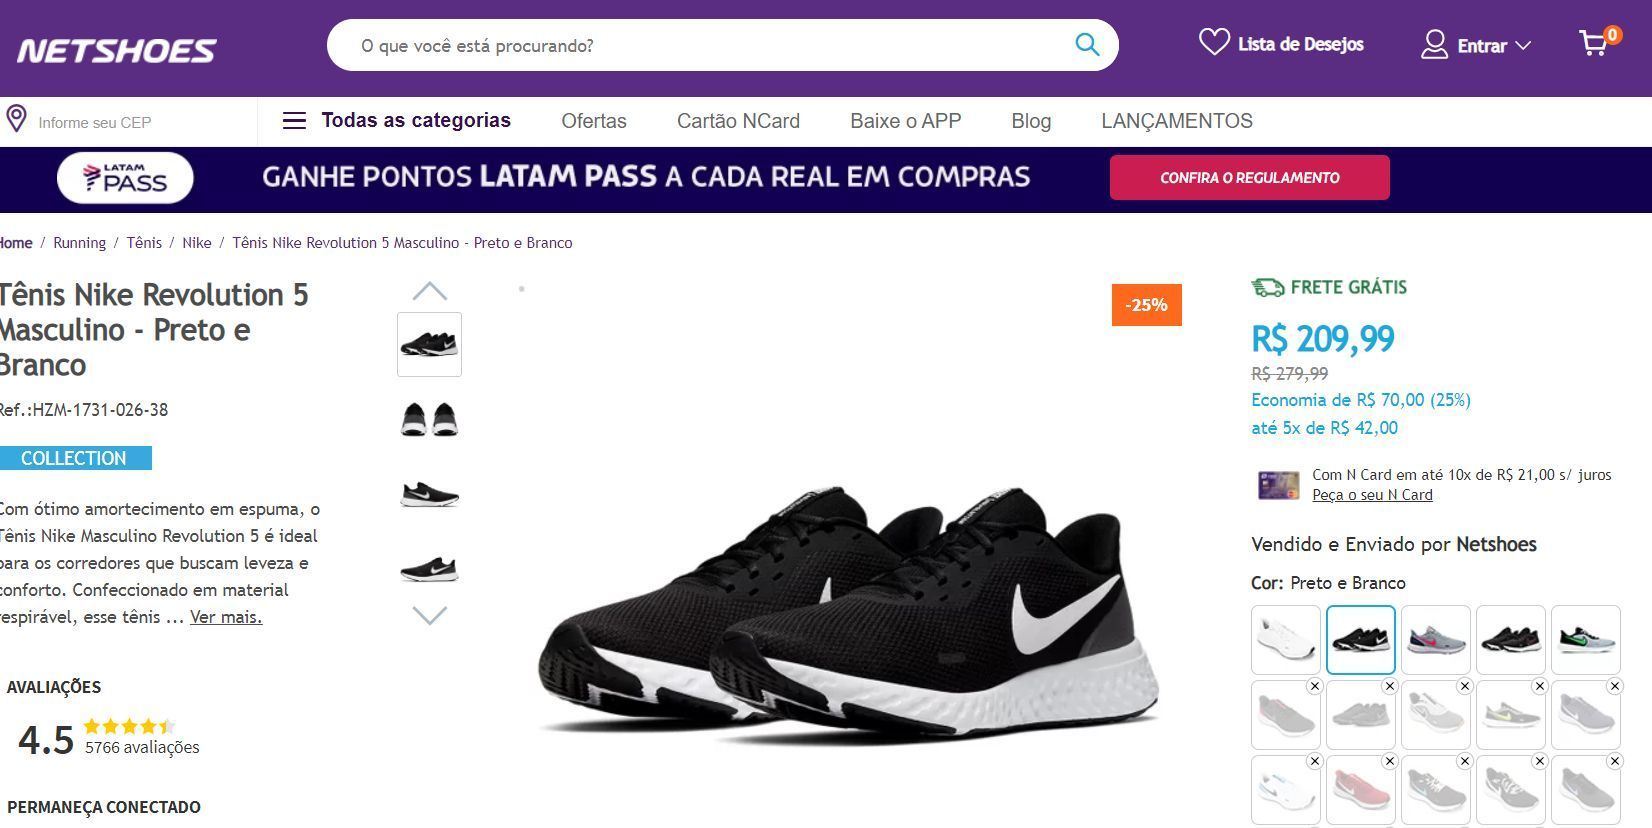 LATAM Netshoes 8 pontos